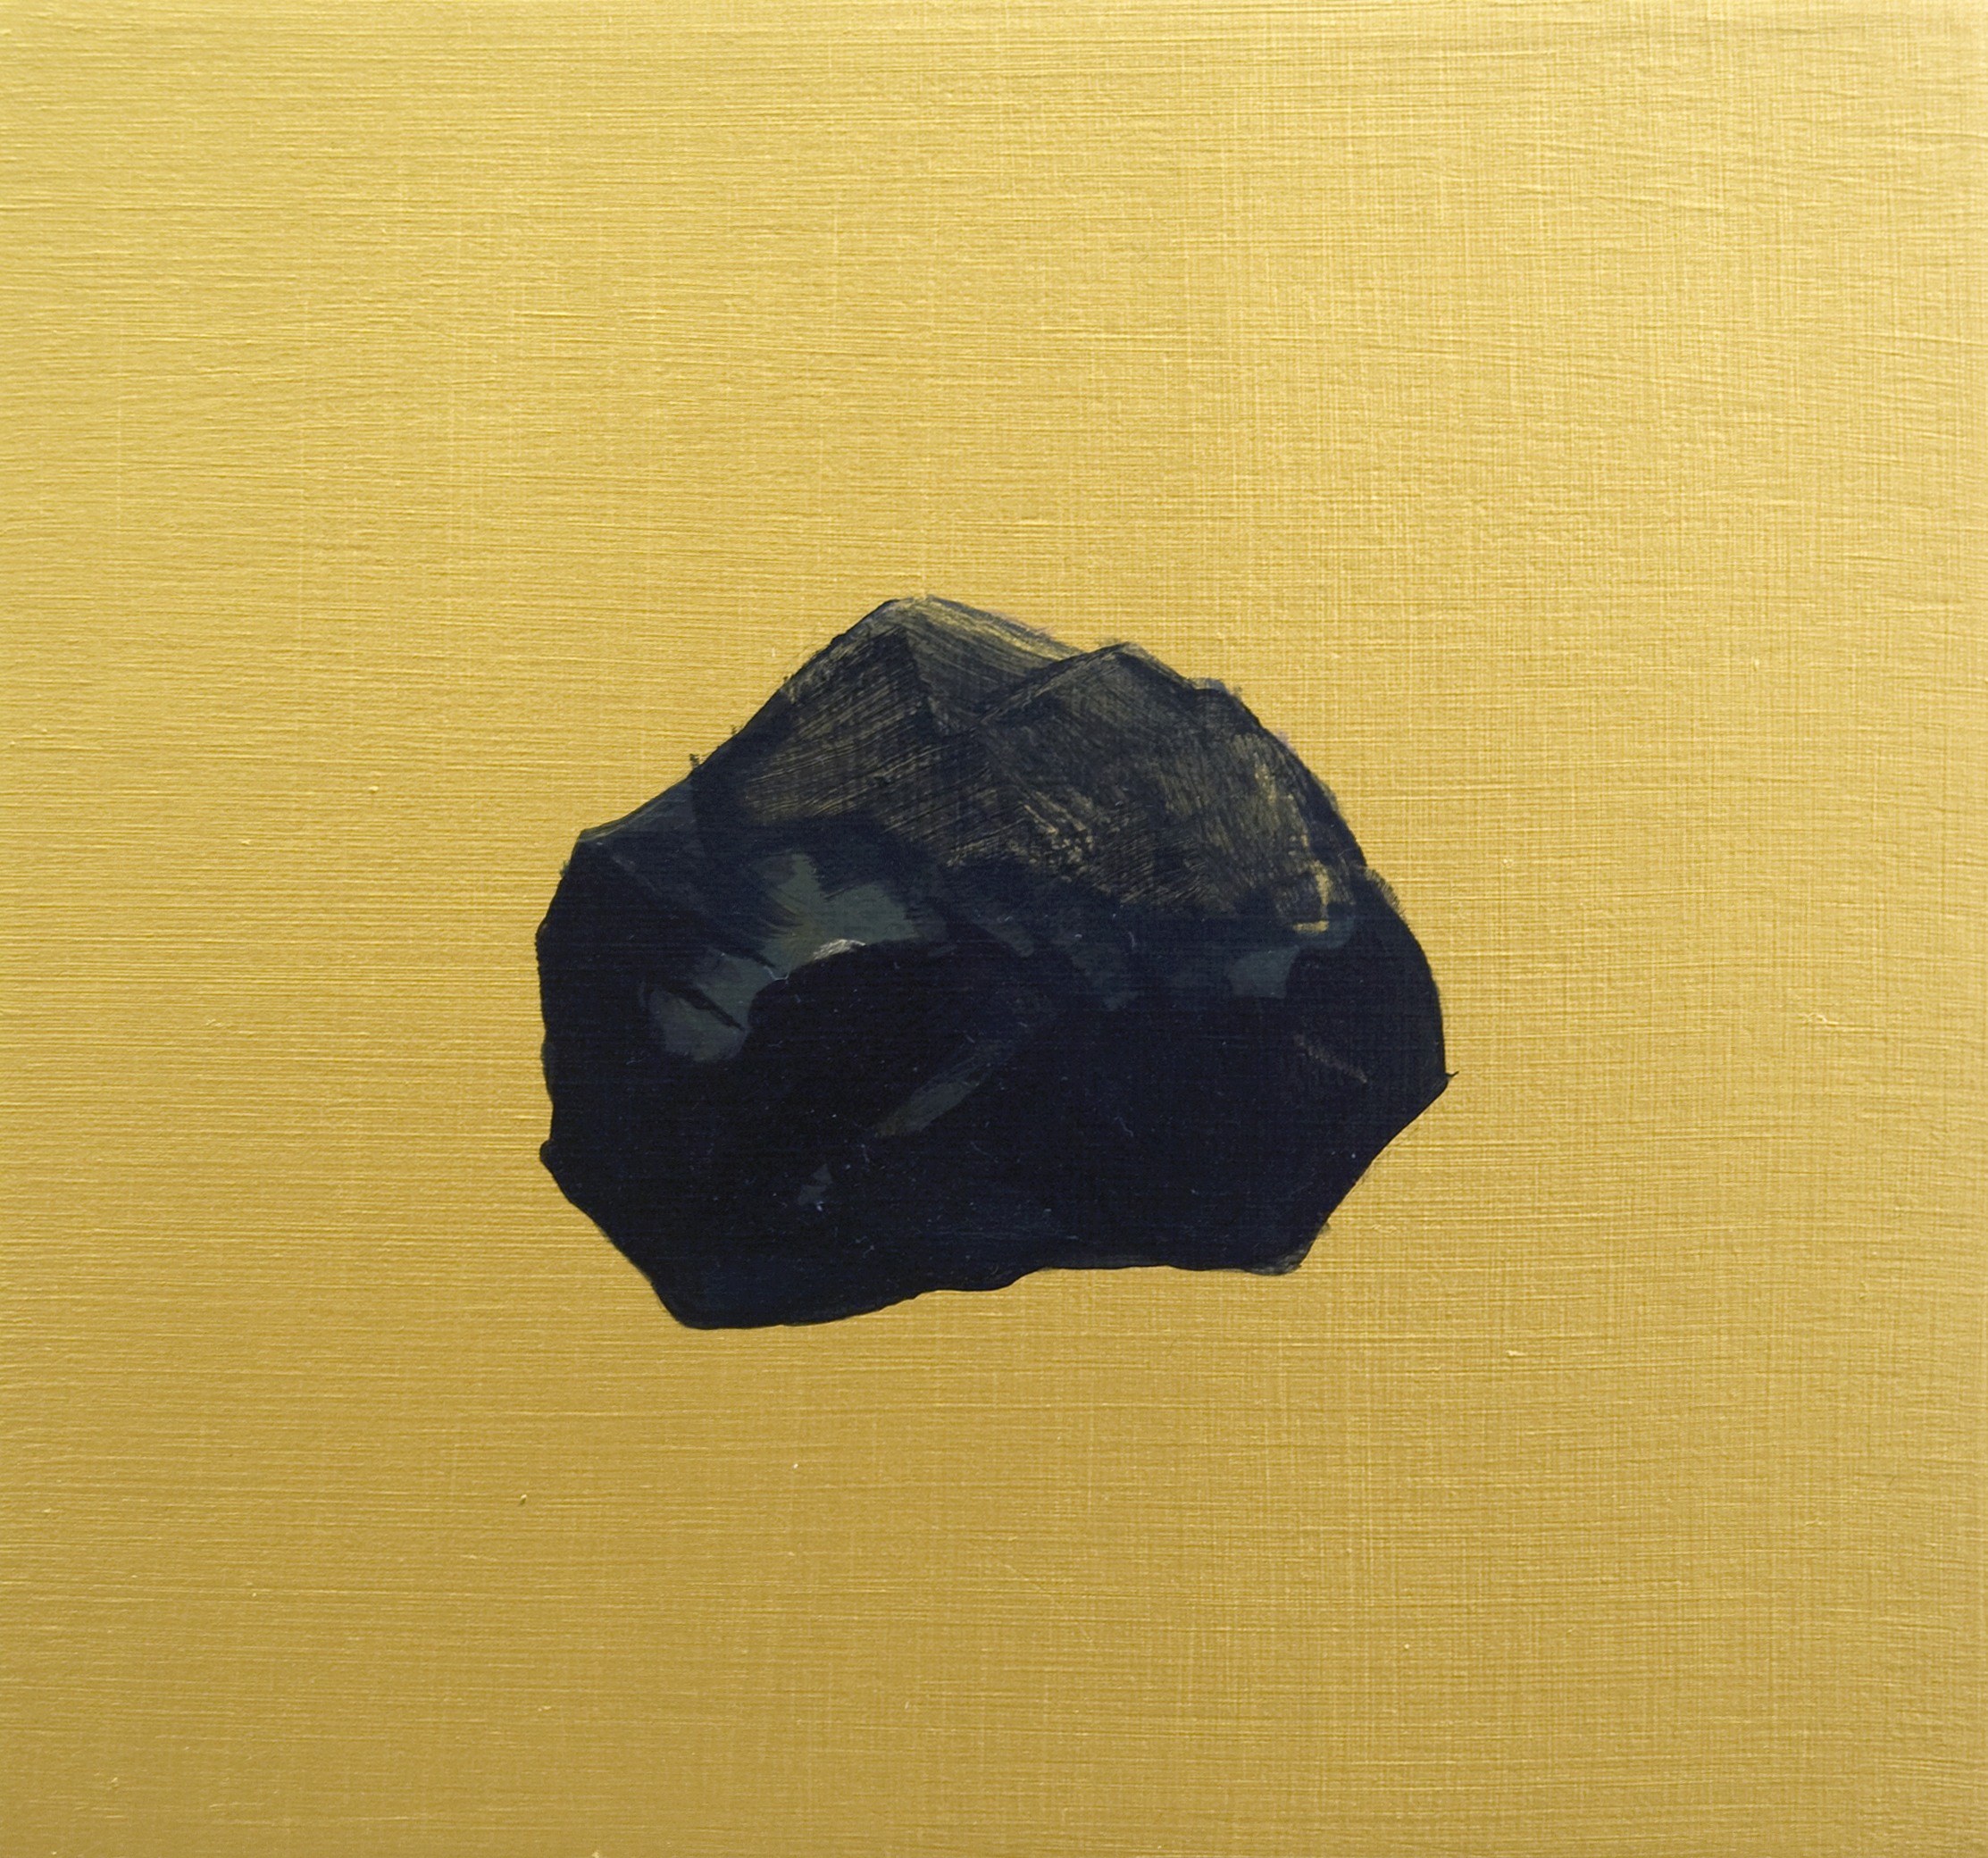 Coal 1 2017 Acrylic on birch ply, 6 x 6 in